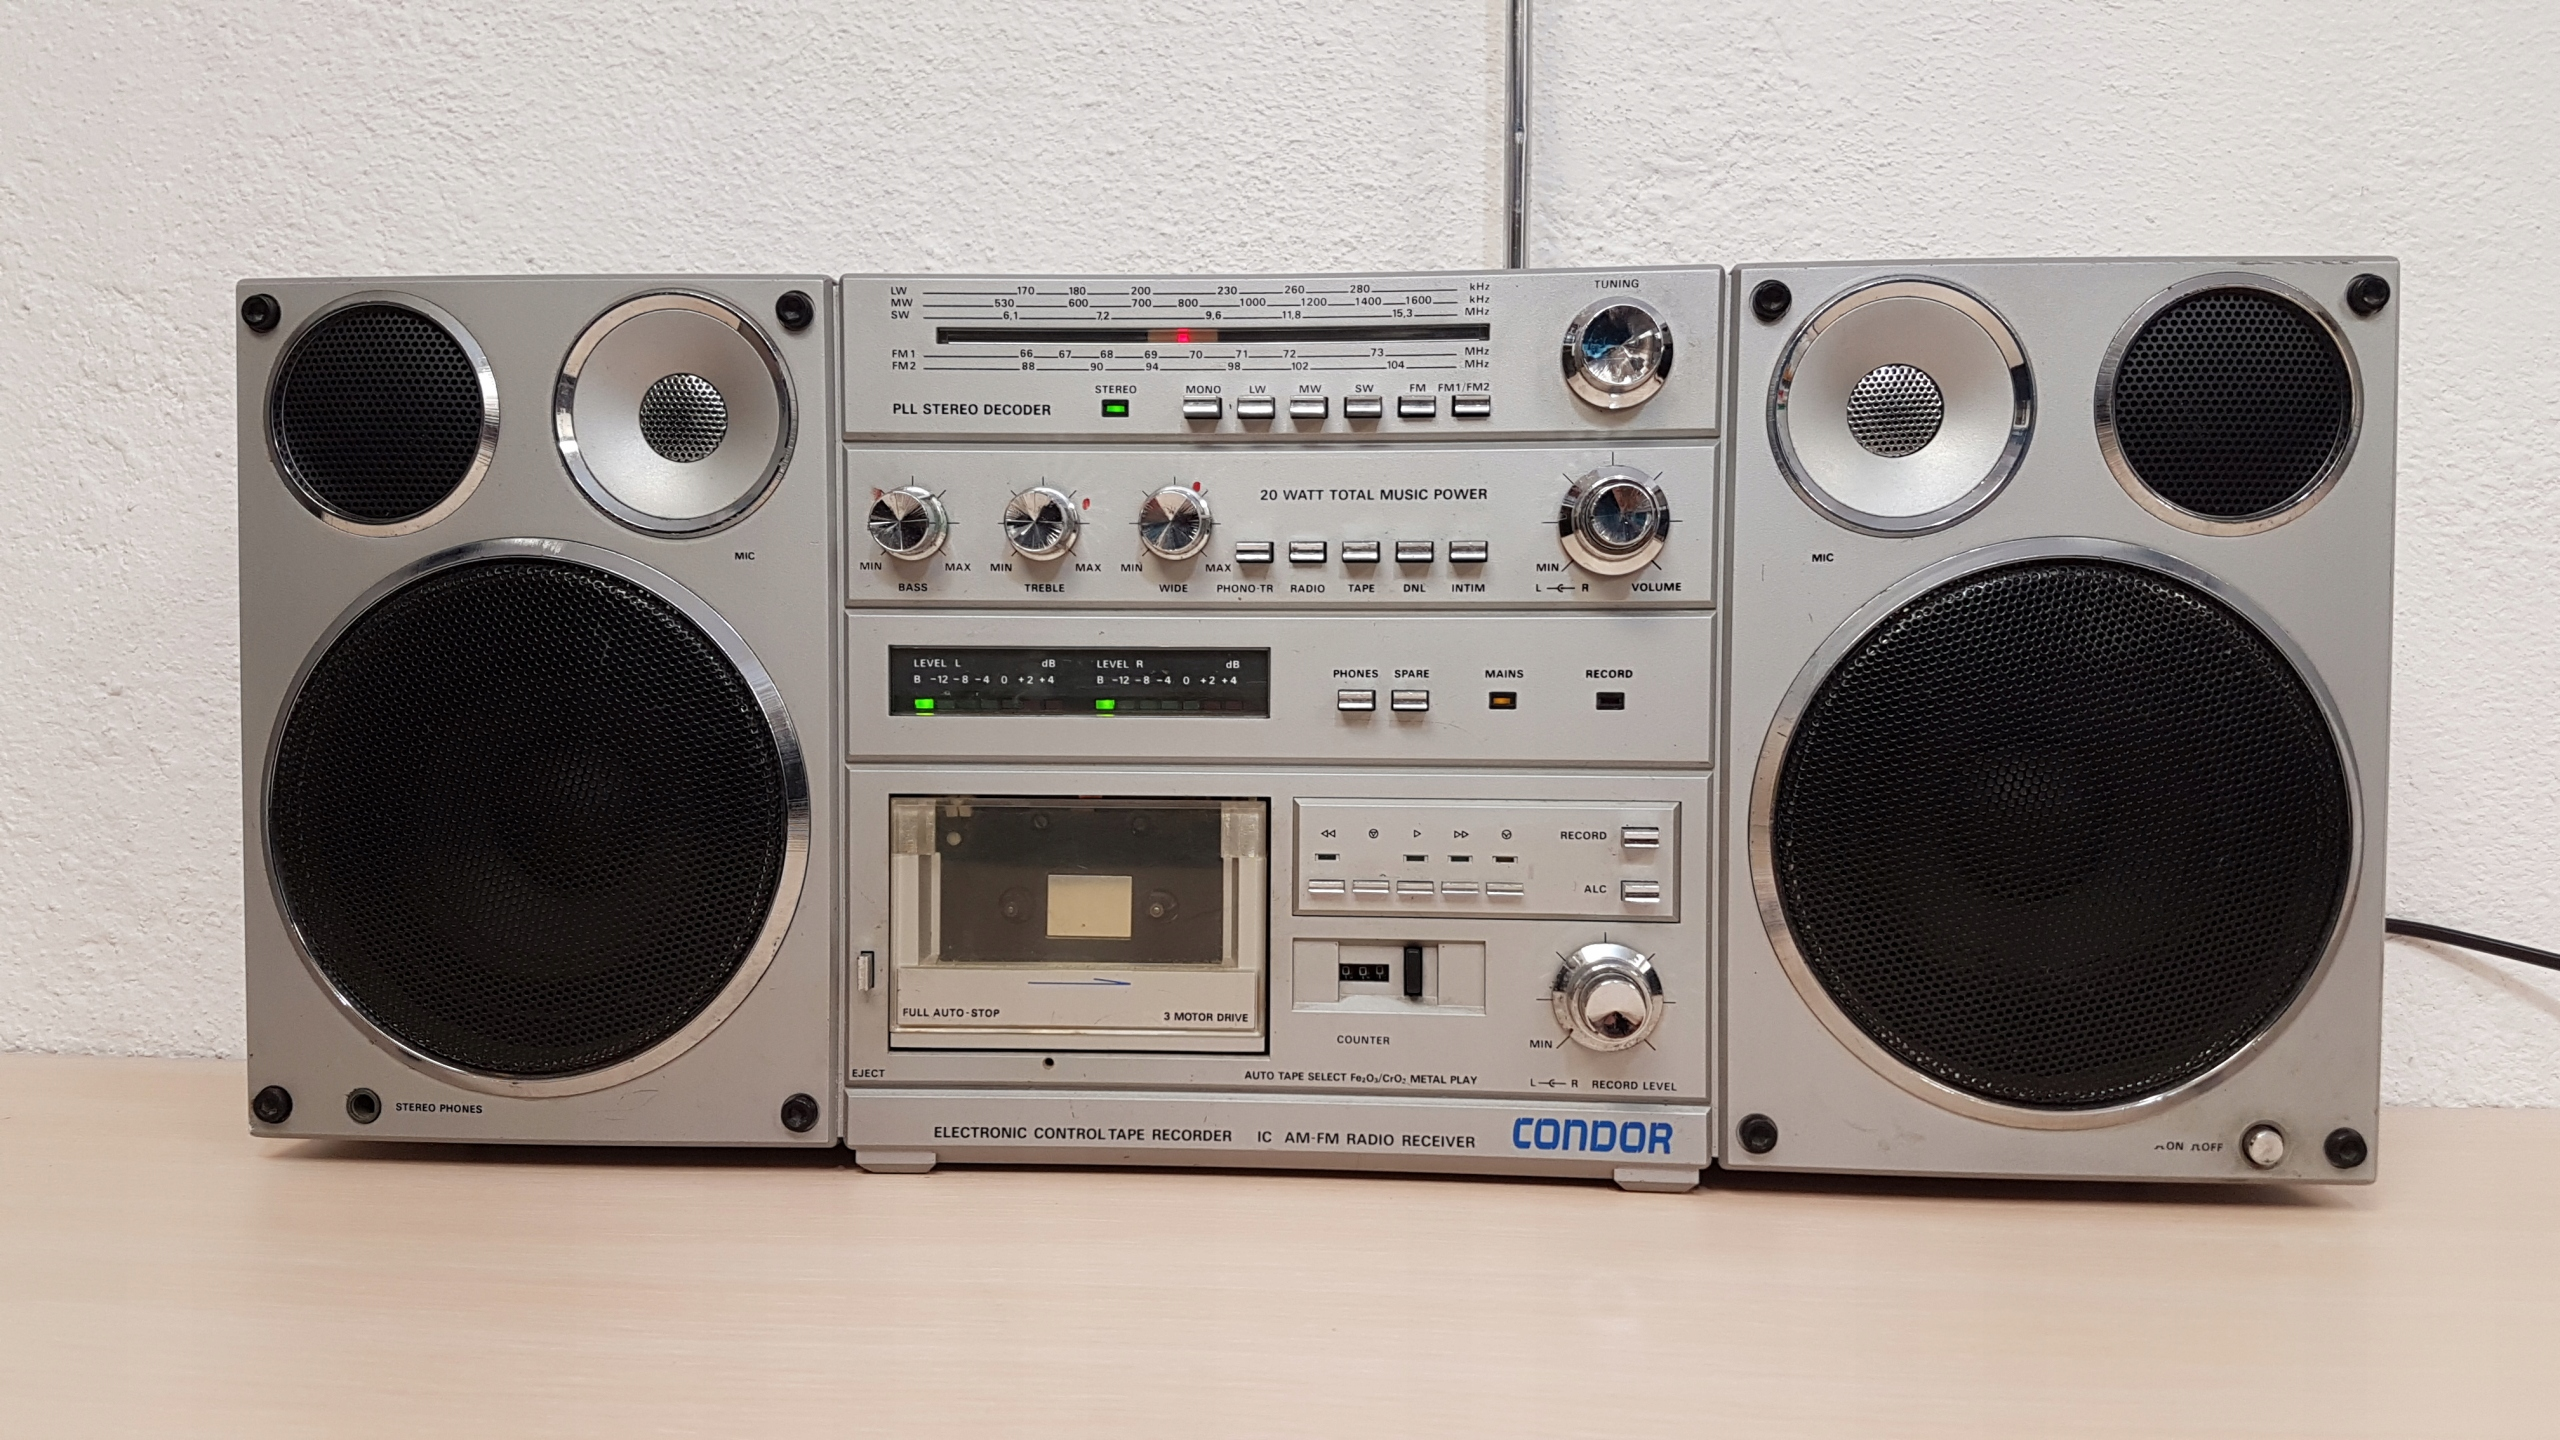 Inne rodzaje Piękny SREBRNY Condor Unitra radio rm 820s - 7696585692 AM45